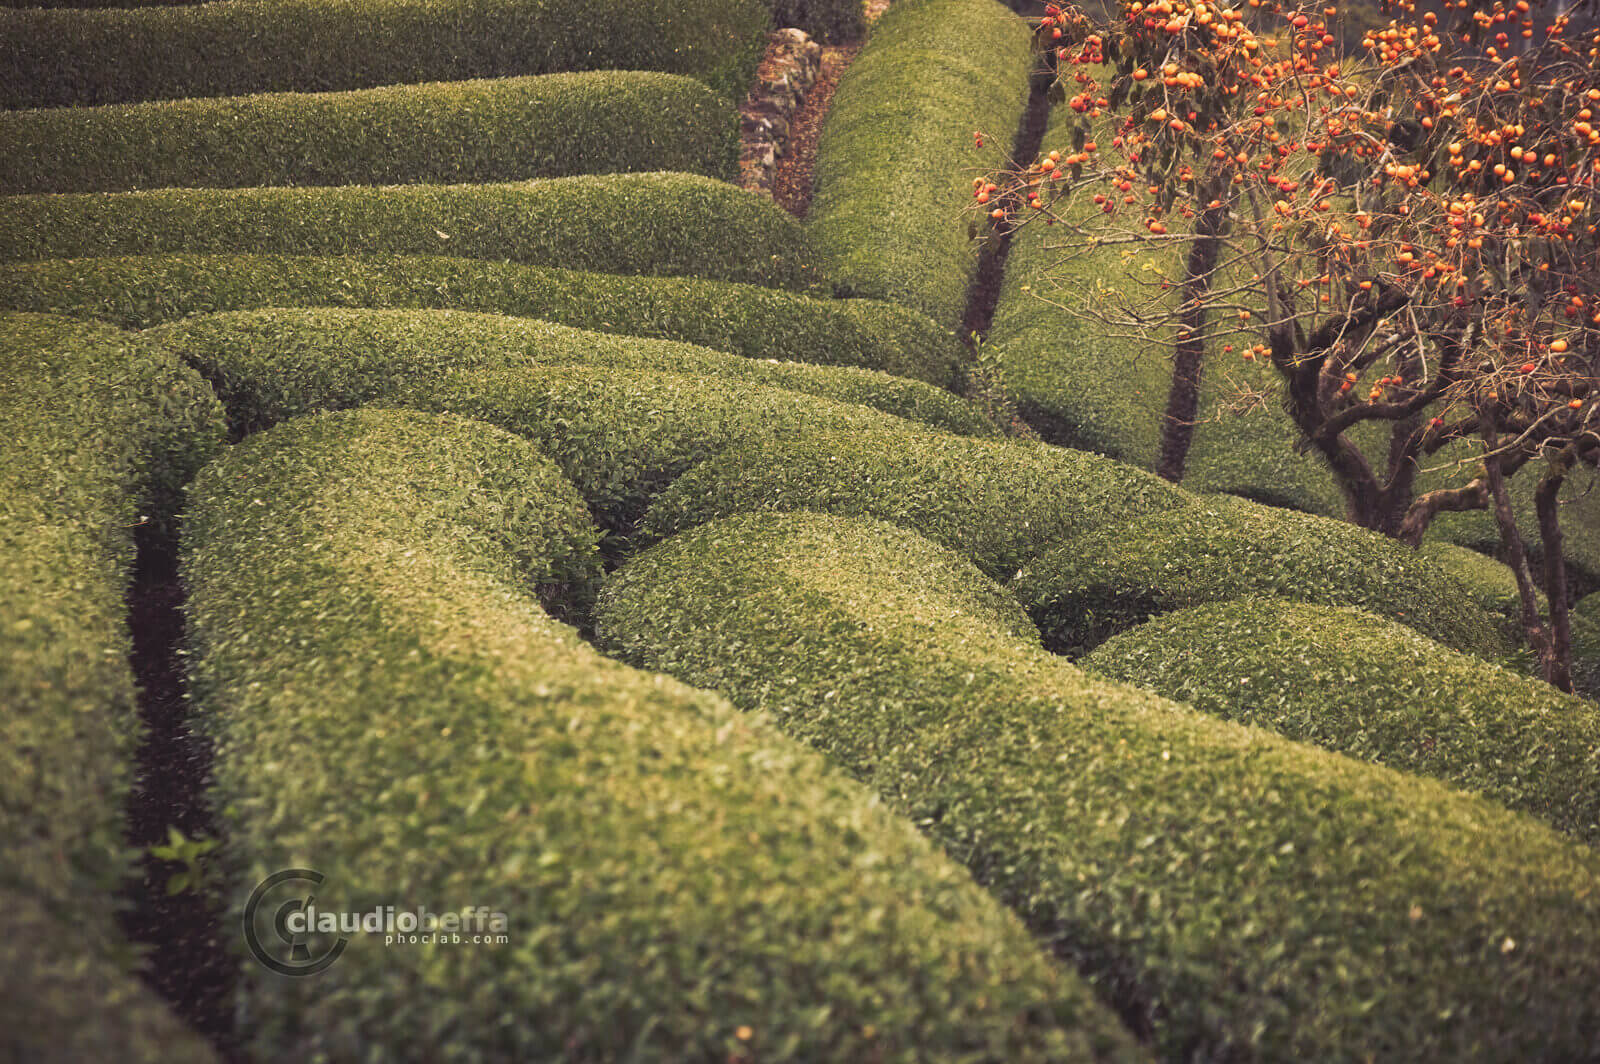 Tea, Plantation, Persimmon, Tree, Wazuka, Kyoto, Japan, Countryside, Tradition, Travel, Landscape, Tea culture in Japan, Camellia and Persimmon